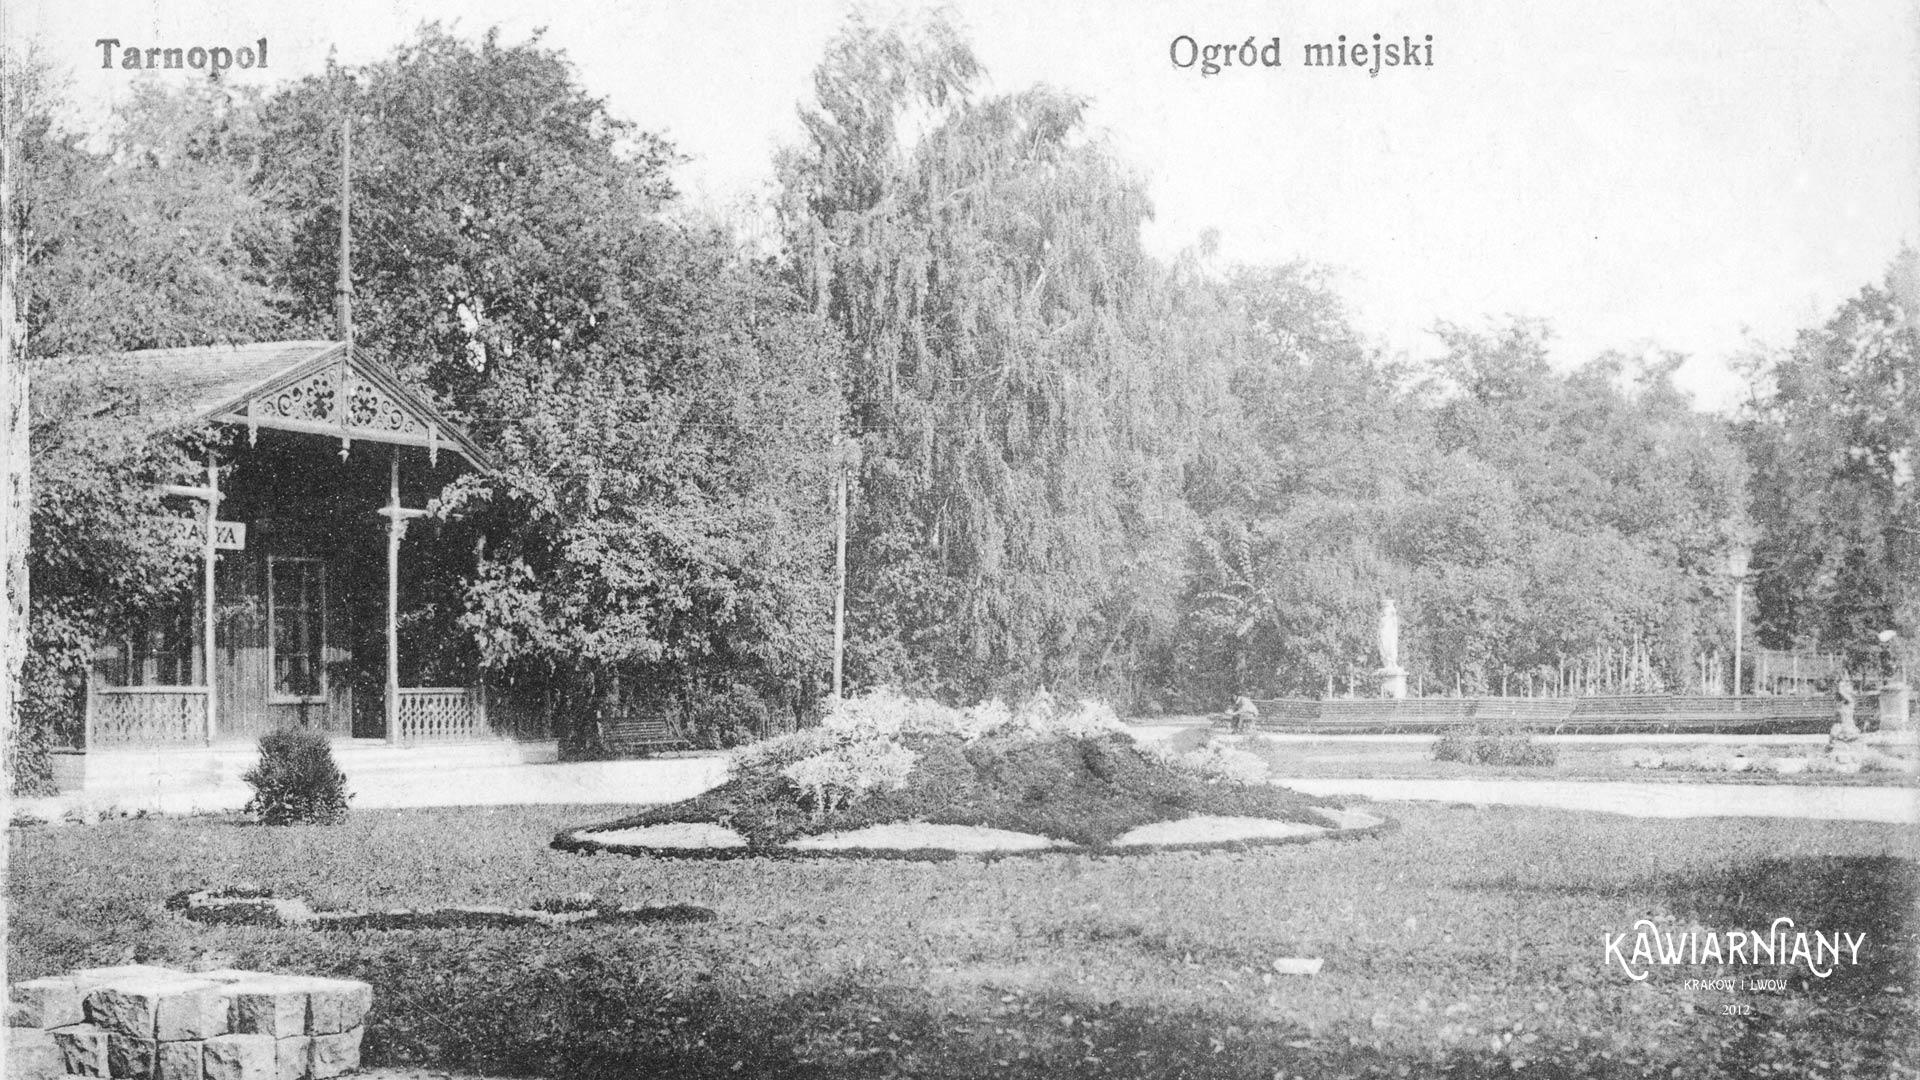 Ogród miejski, Tarnopol